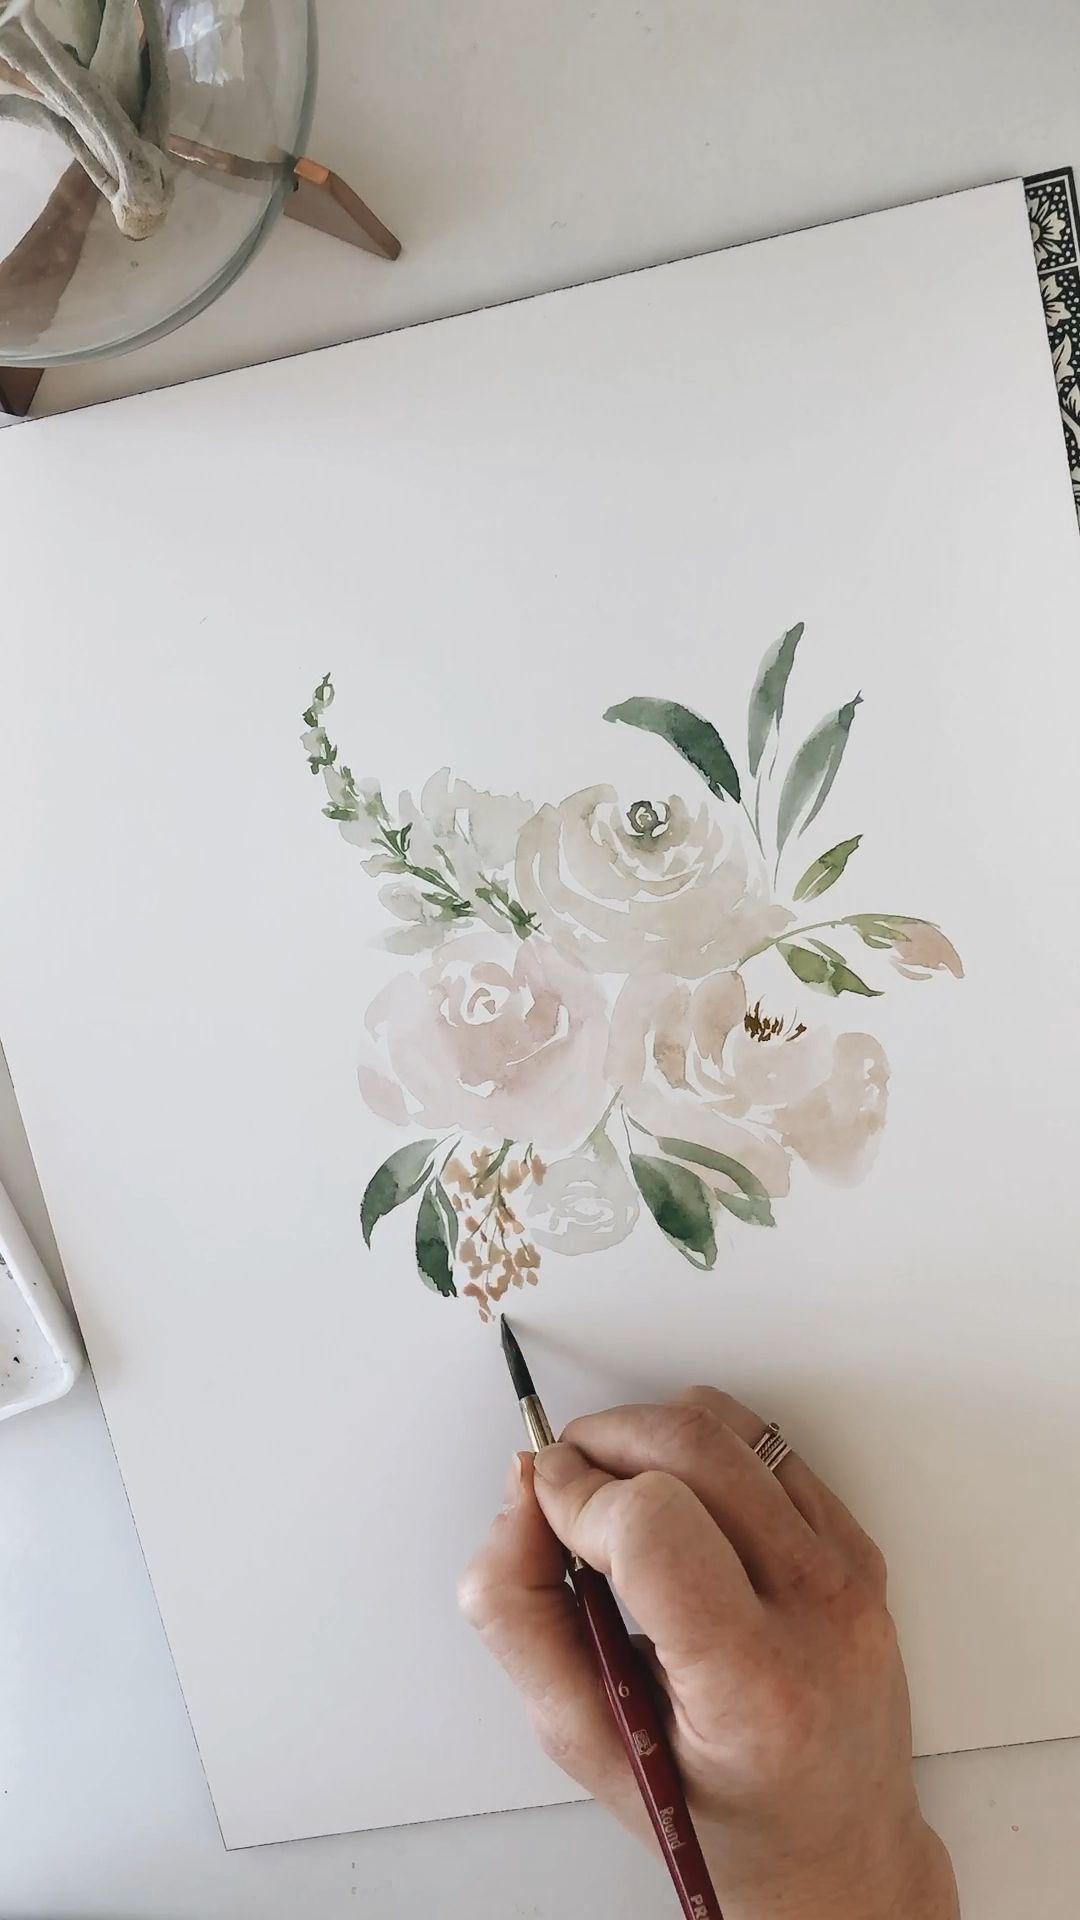 Photography Inspo Videos Paint Photographyeveryday Photographyislife Photographylover Blumen Aquarell Blumen Gemalde Blumenzeichnung